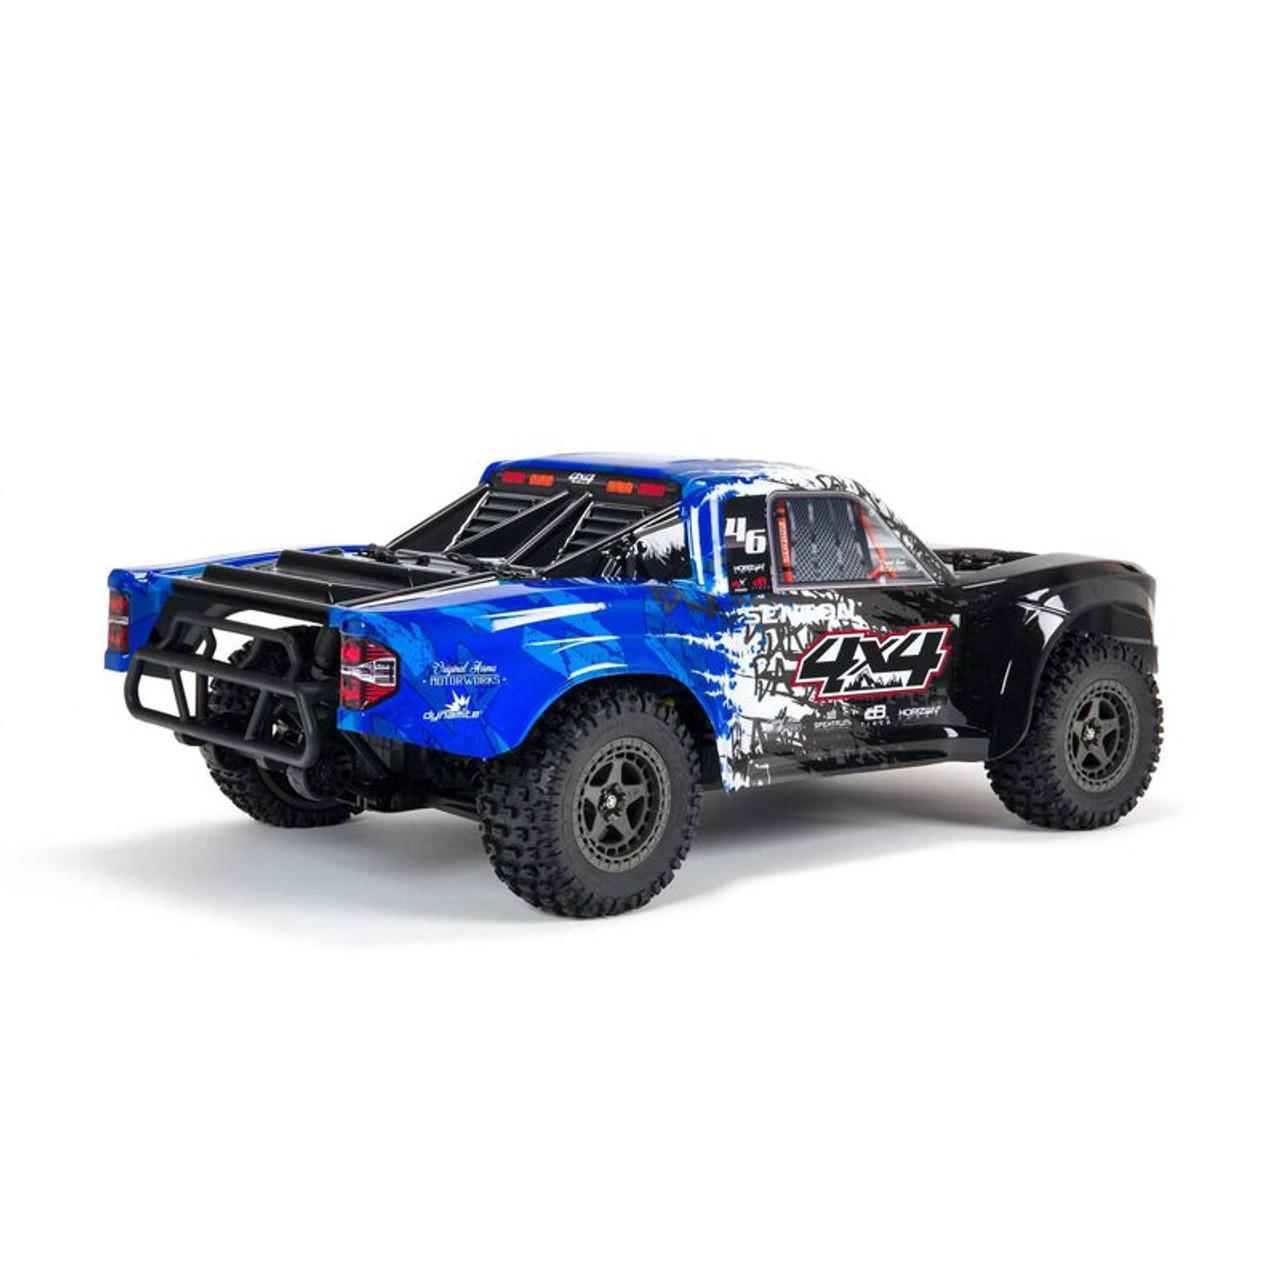 Arrma Senton 4X4 V3 3S BLX 1/10 RTR Brushless Short Course Truck (Blue) w/Spektrum SLT3 2.4GHz Radio